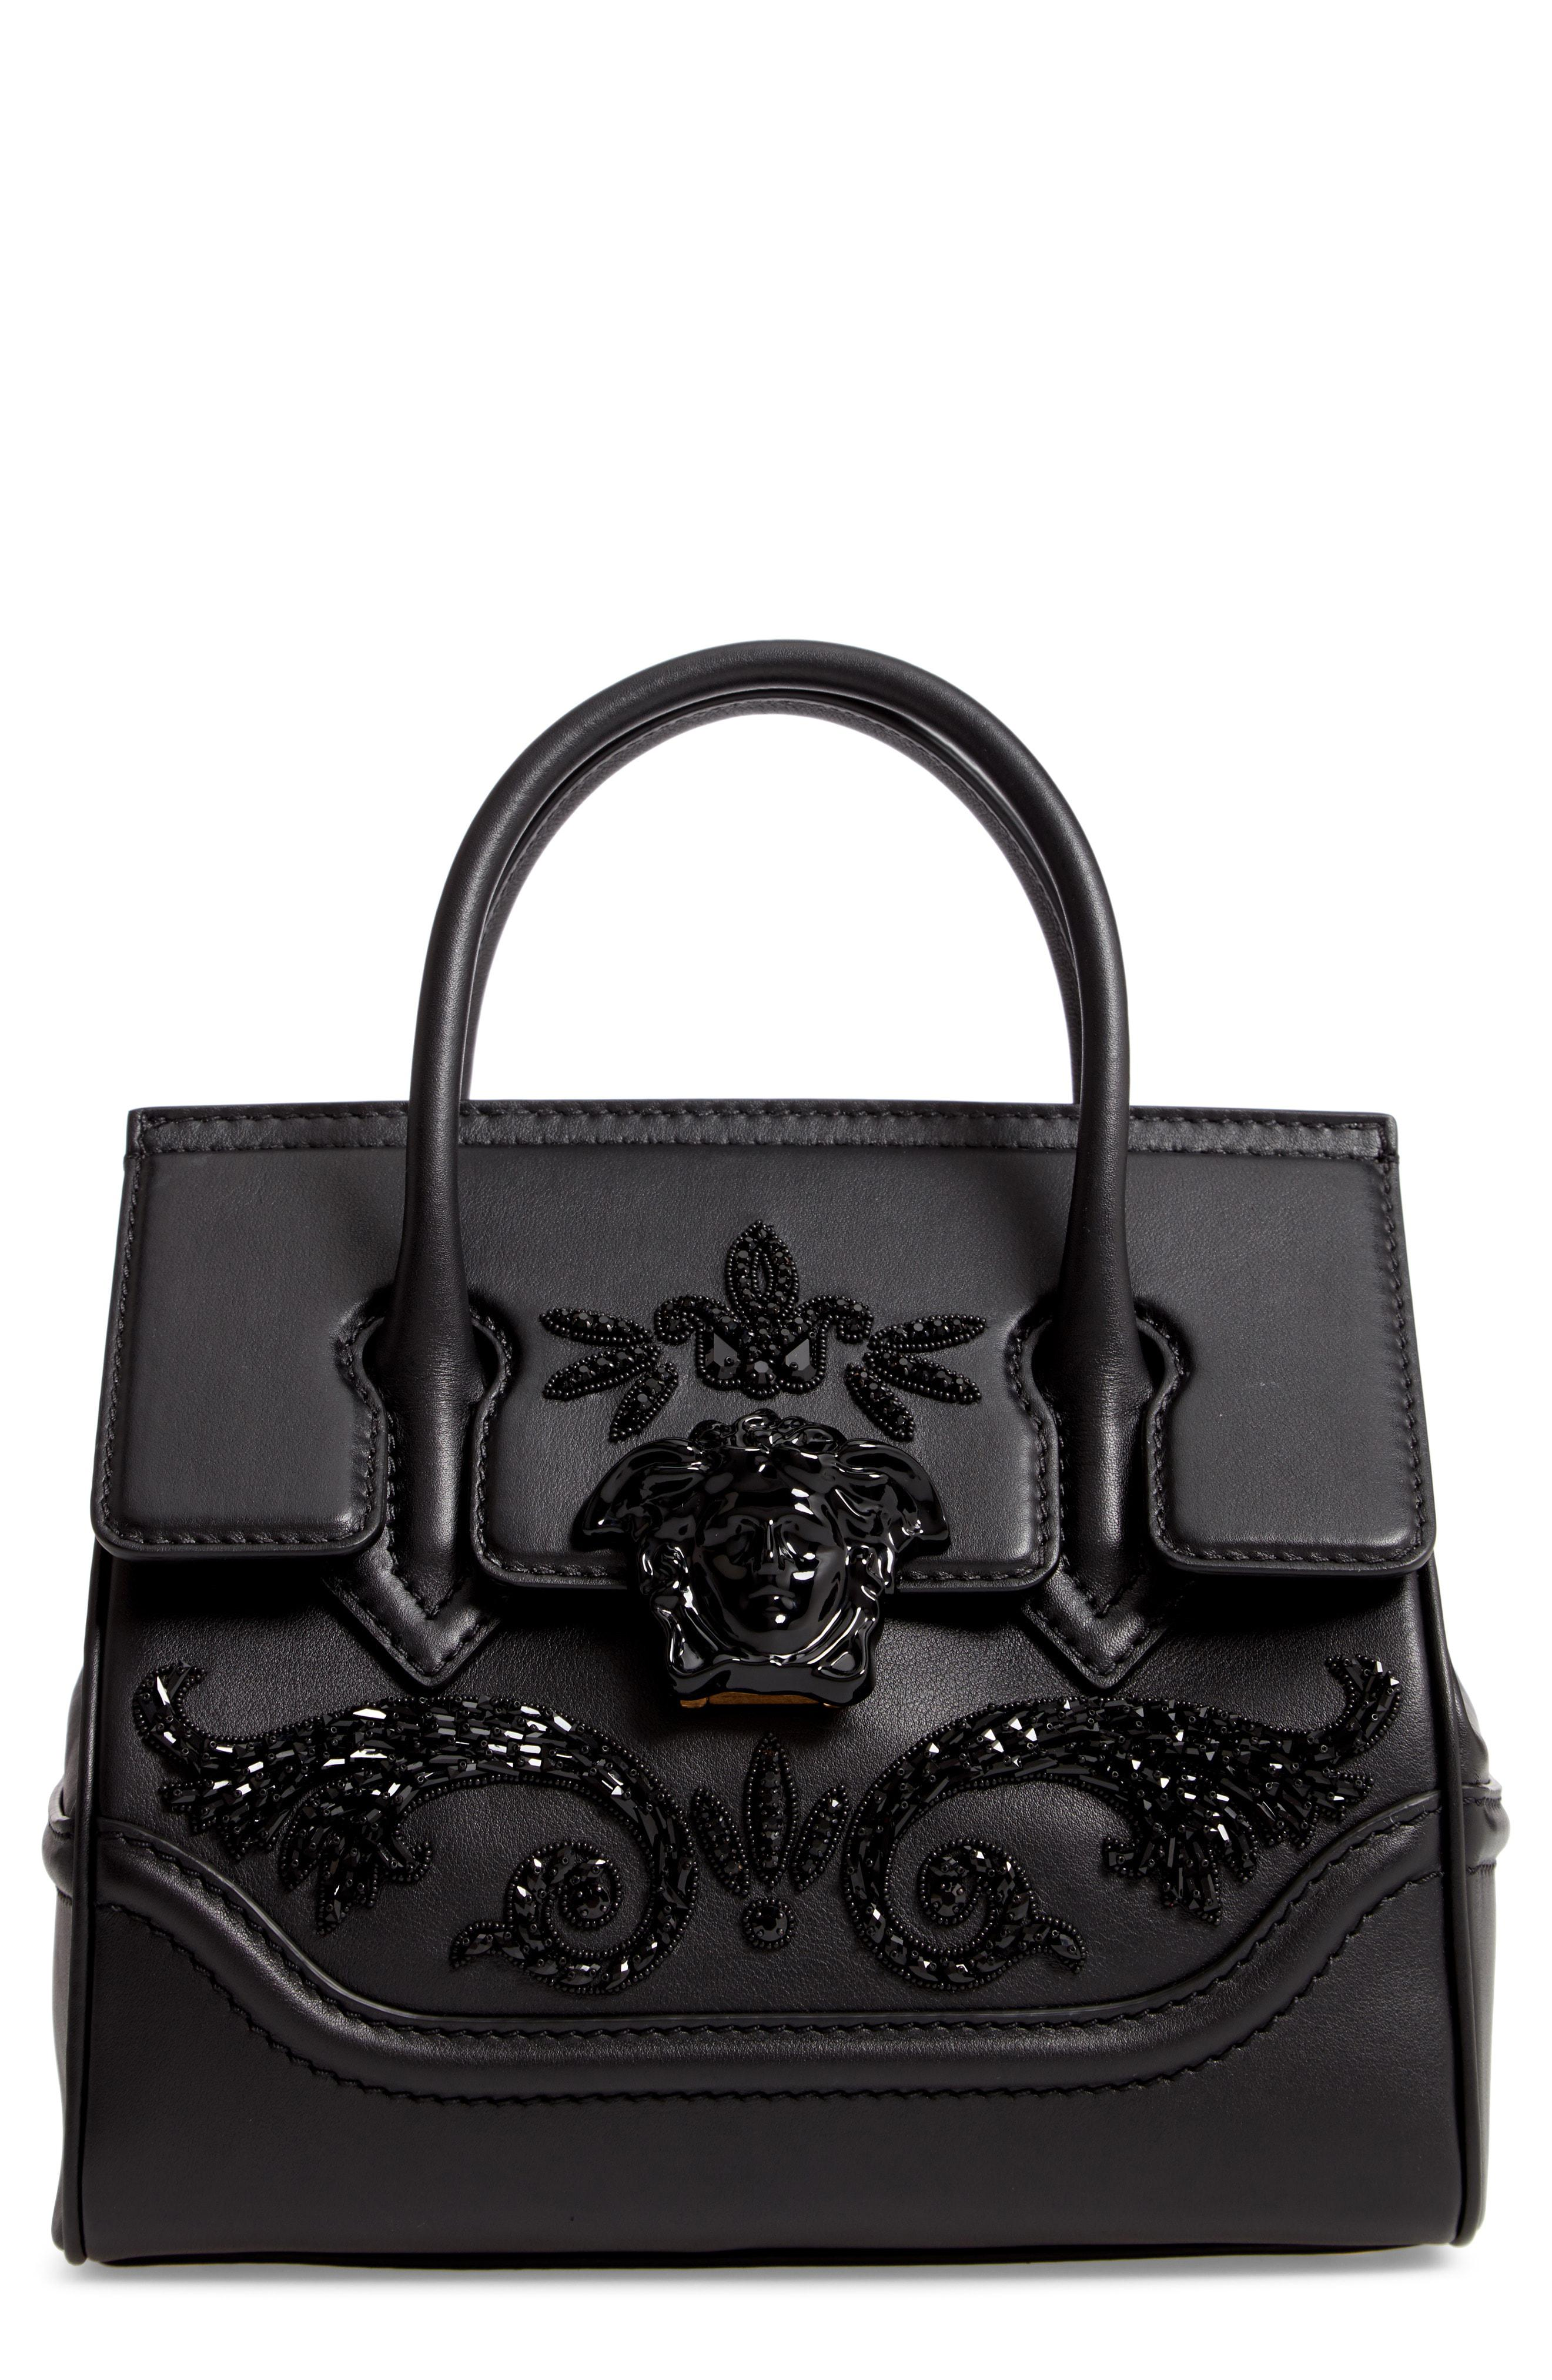 Lyst - Versace Palazzo Empire Medium Crystal Embellished Leather ... ae2b554ff9519